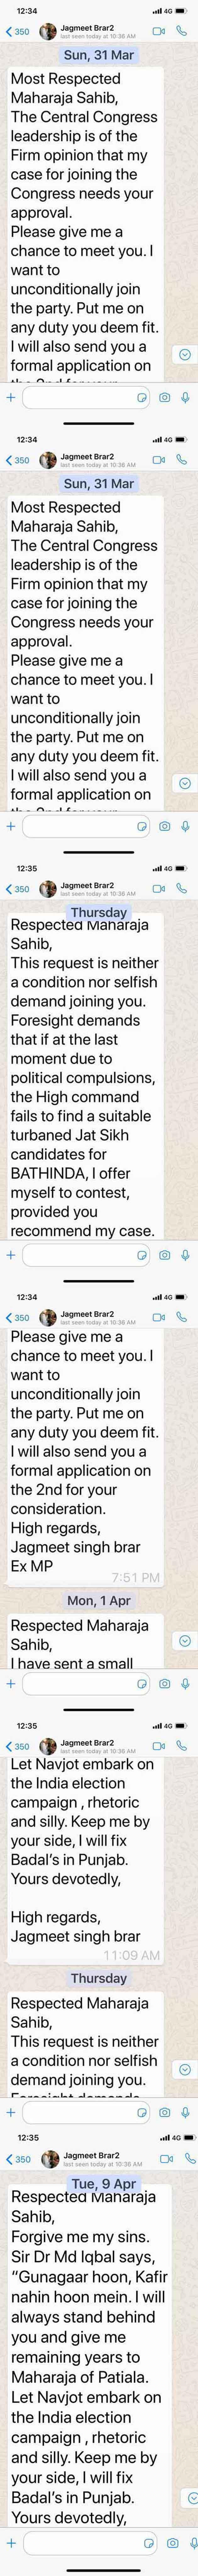 Capt Brar Whatsapp Chat